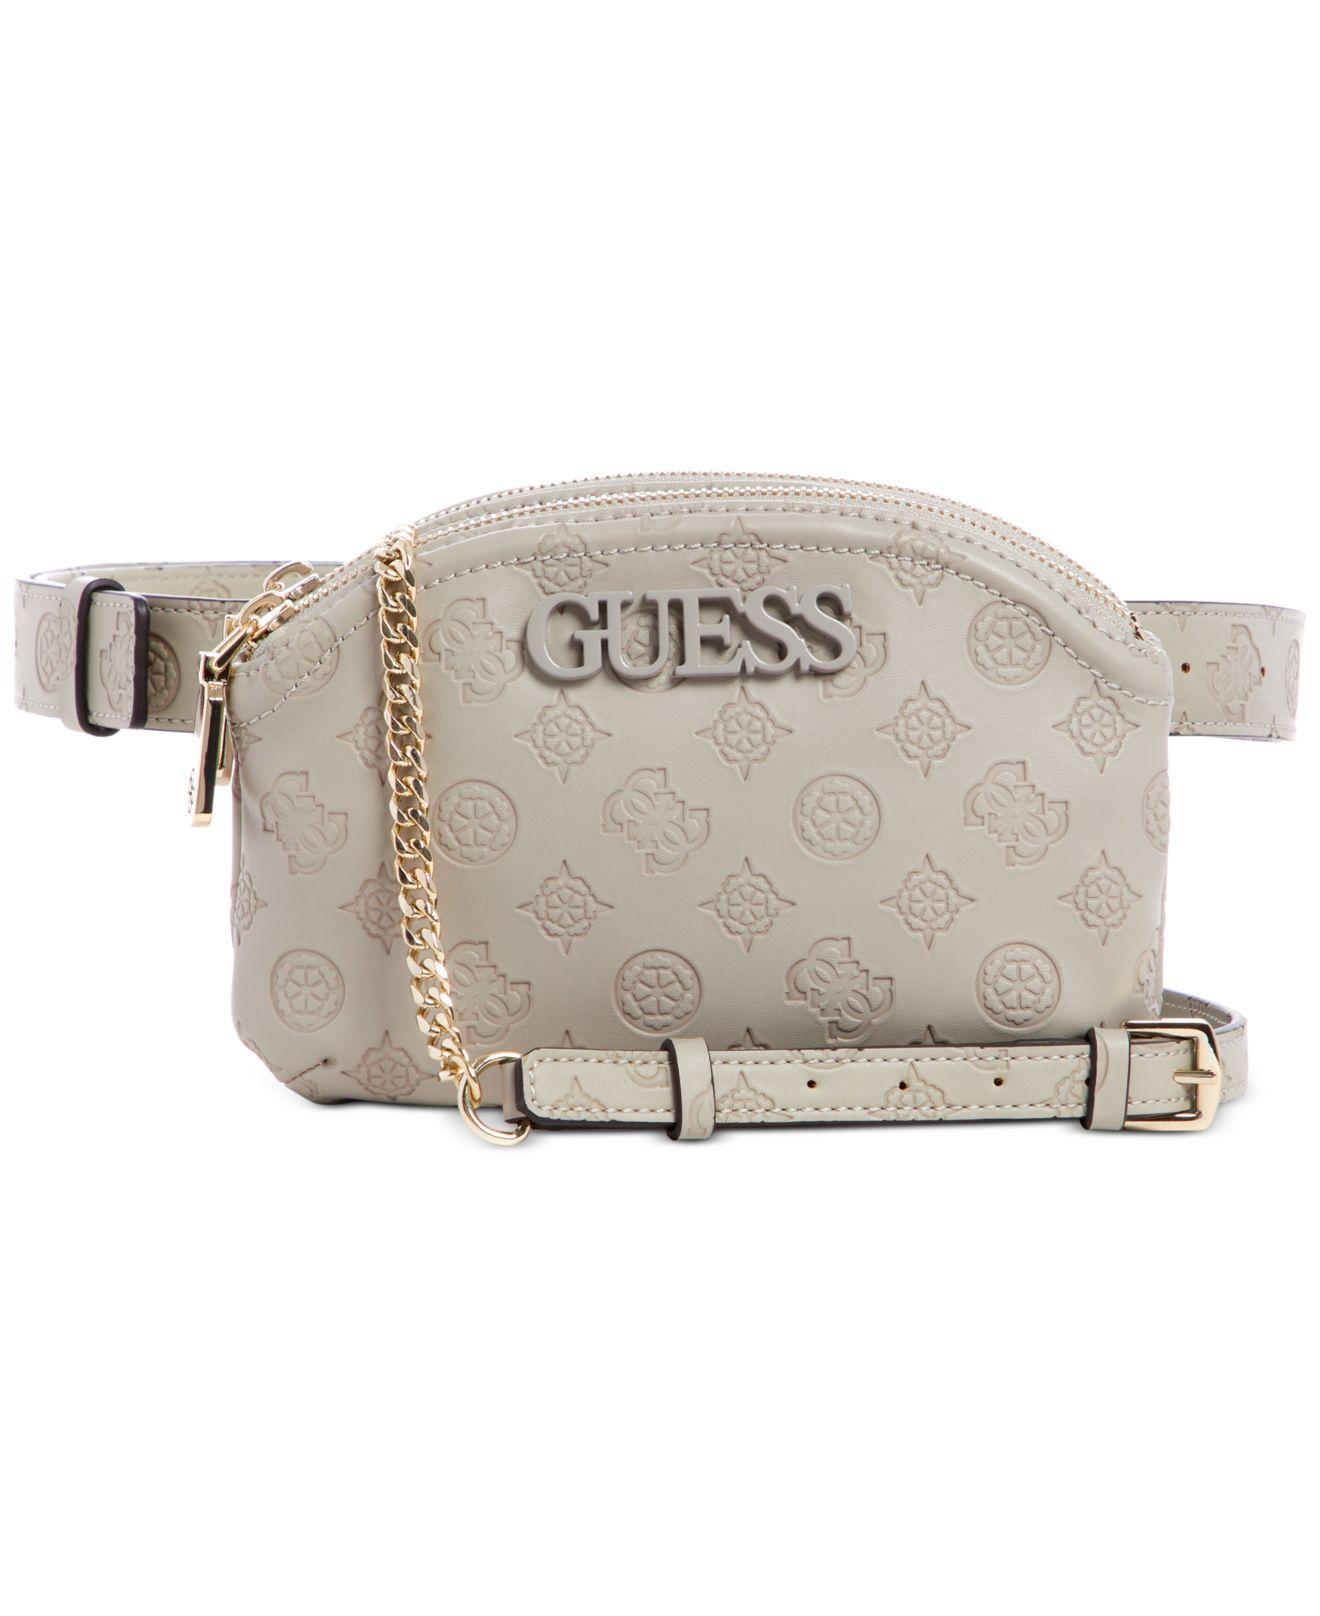 Grey convertible cross body belt bag